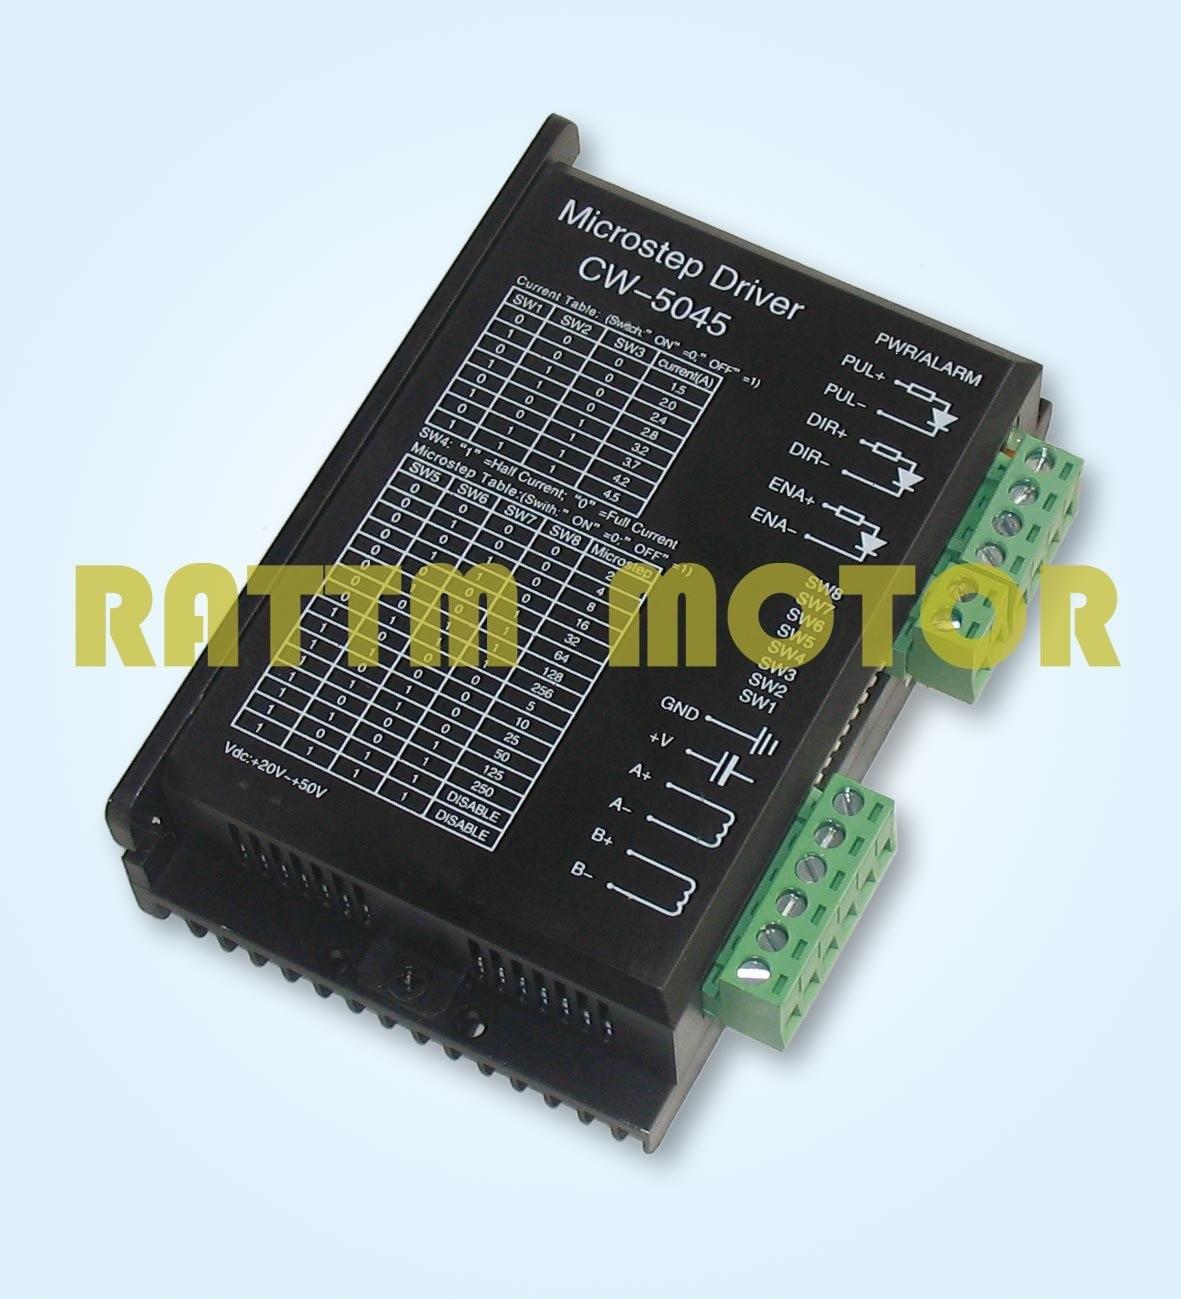 ФОТО New CW5045 stepper motor stepping motor driver 50V/4.5A Microstep 256